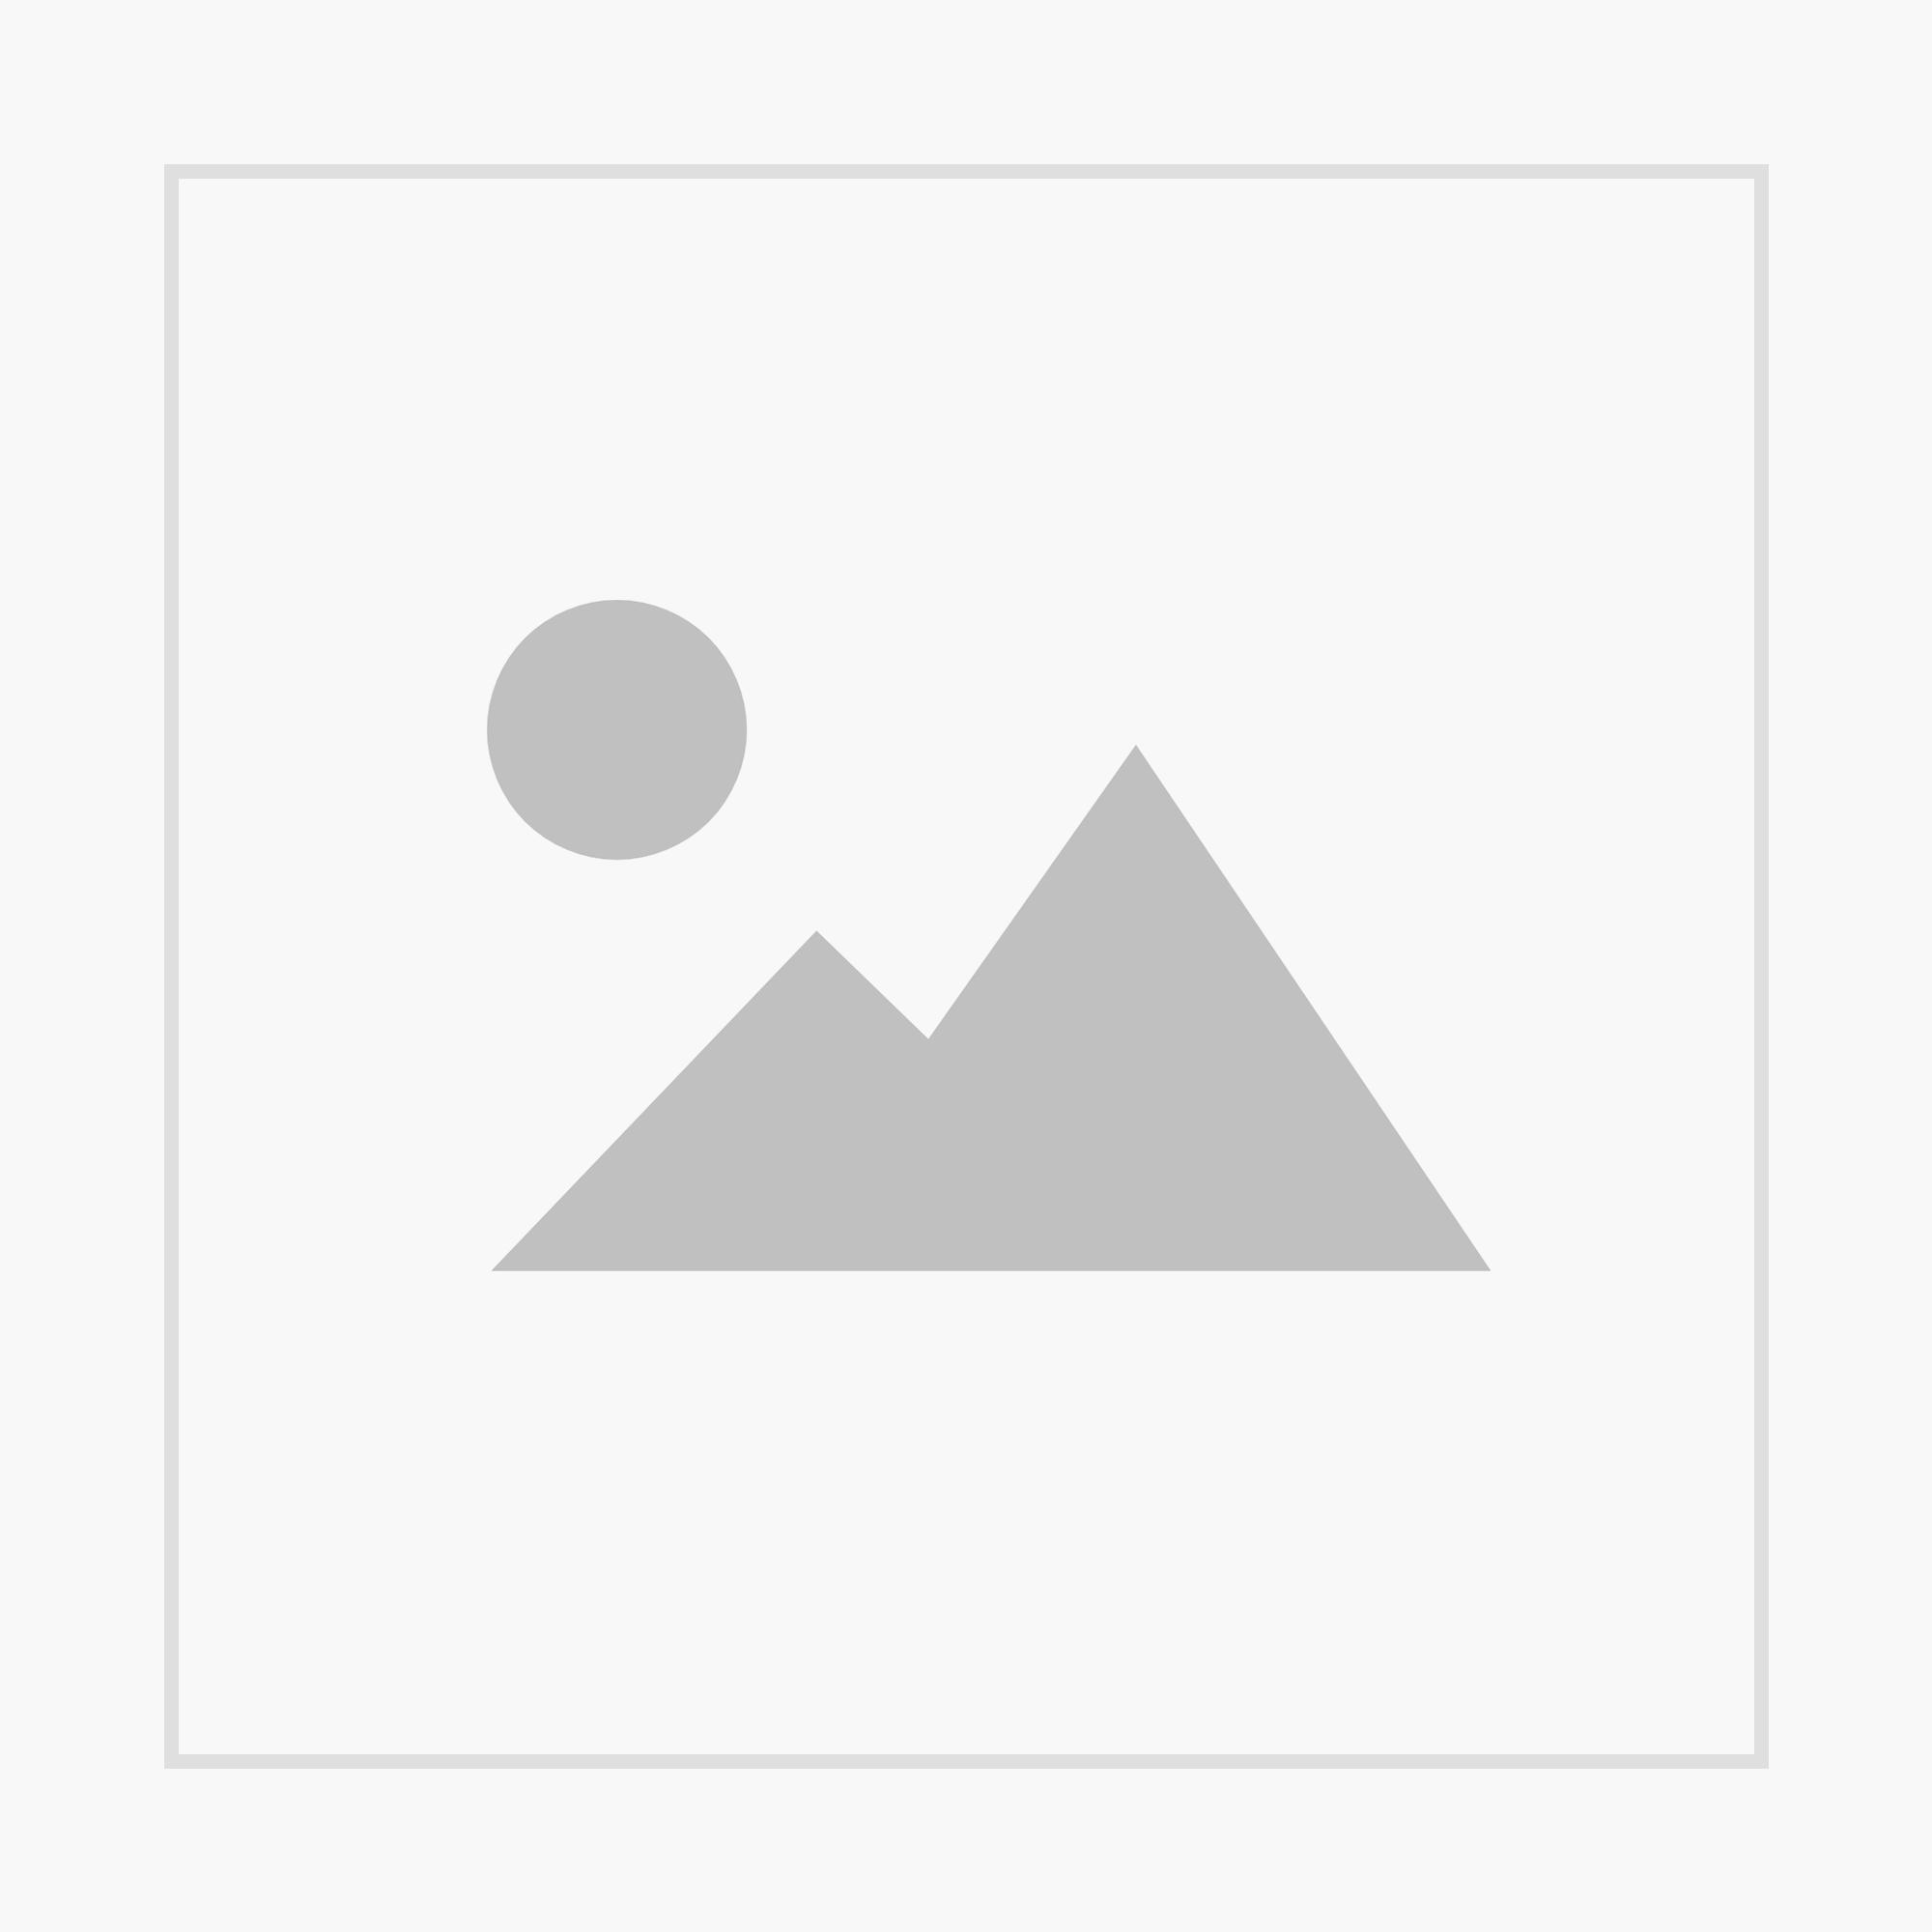 Landtechnik Extrem - Maschinen am Limit